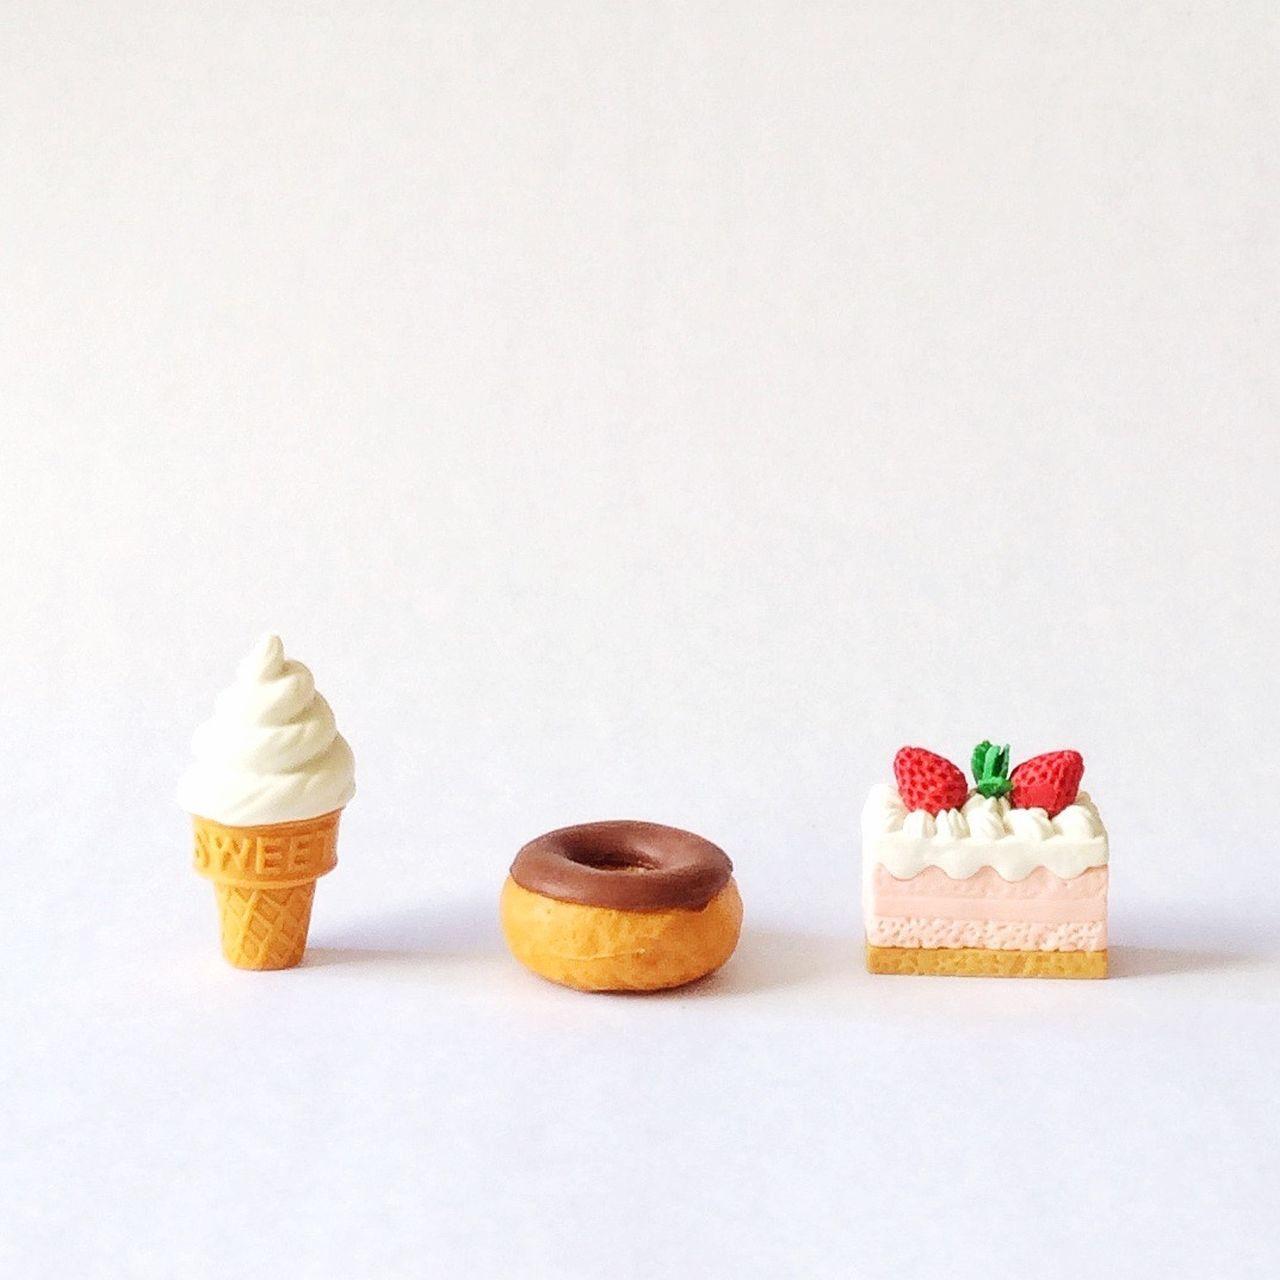 Sweet Sweets. Food Food Art Plastic Plastic Food Cute Ice Cream Cake Doughnuts Sweet Sweets Sweet Things Cute Eraser Small Things Pastel Power The Shop Around The Corner